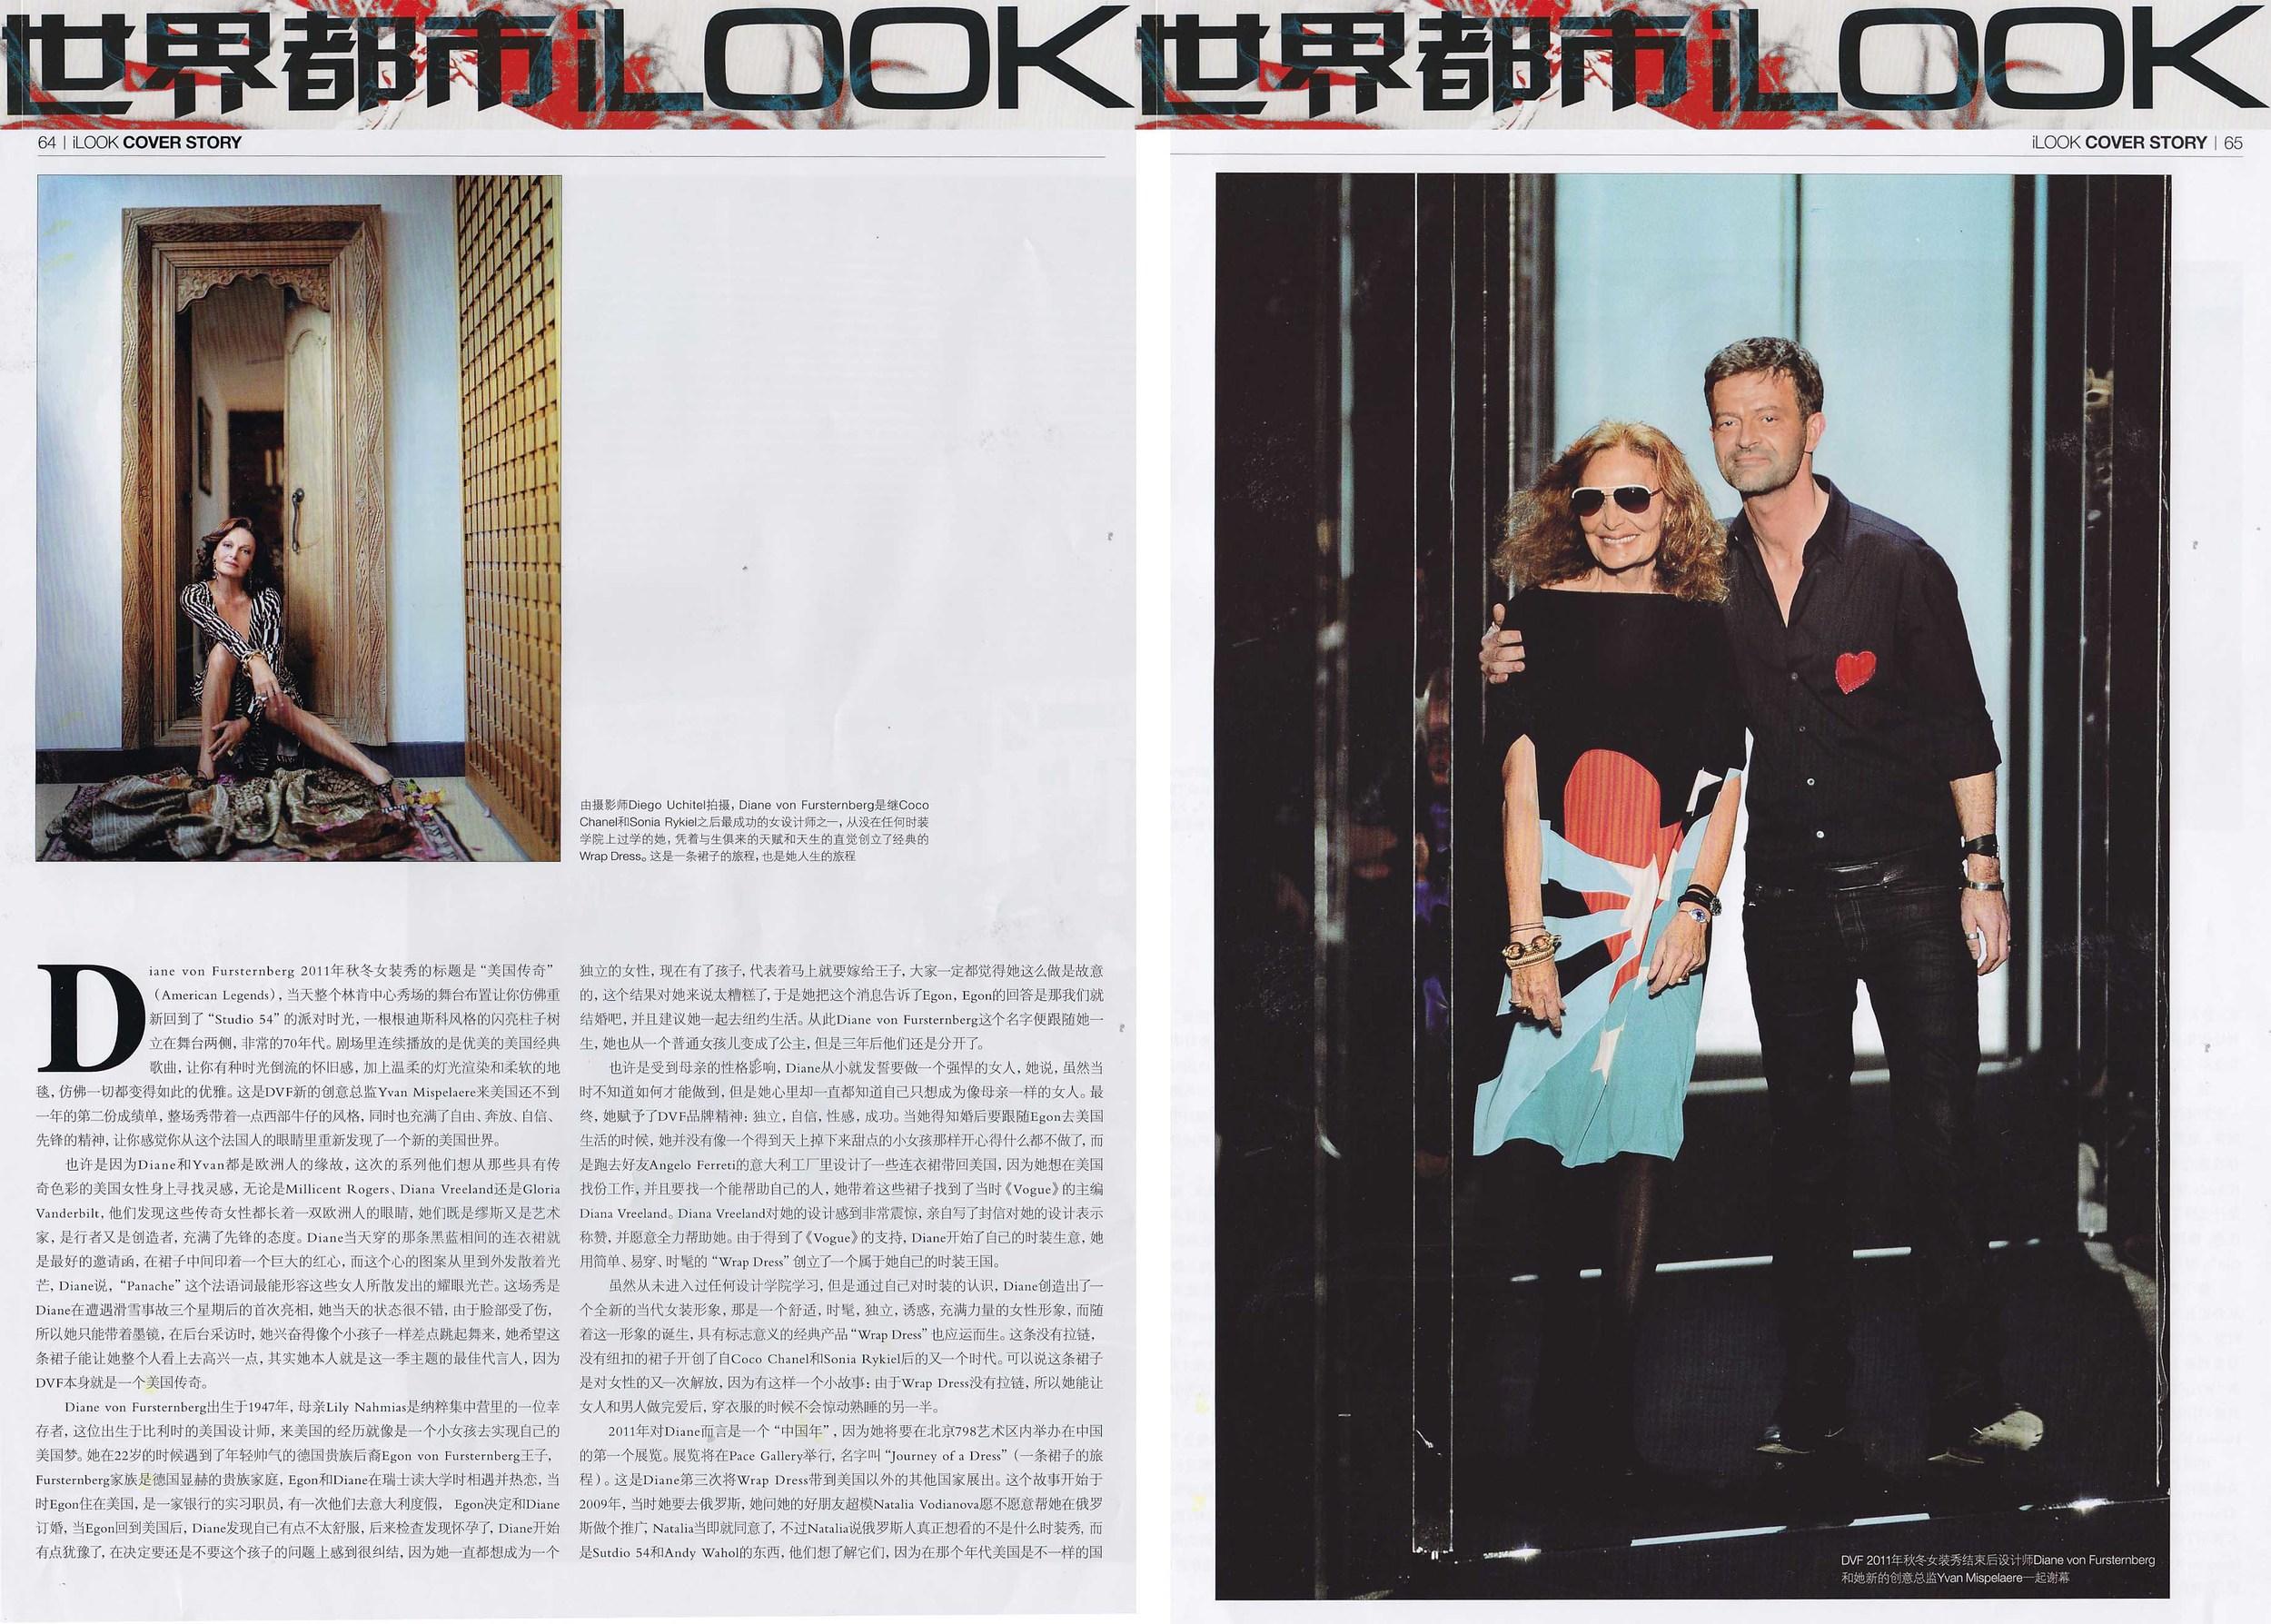 iLook China 04, March 2011.jpg